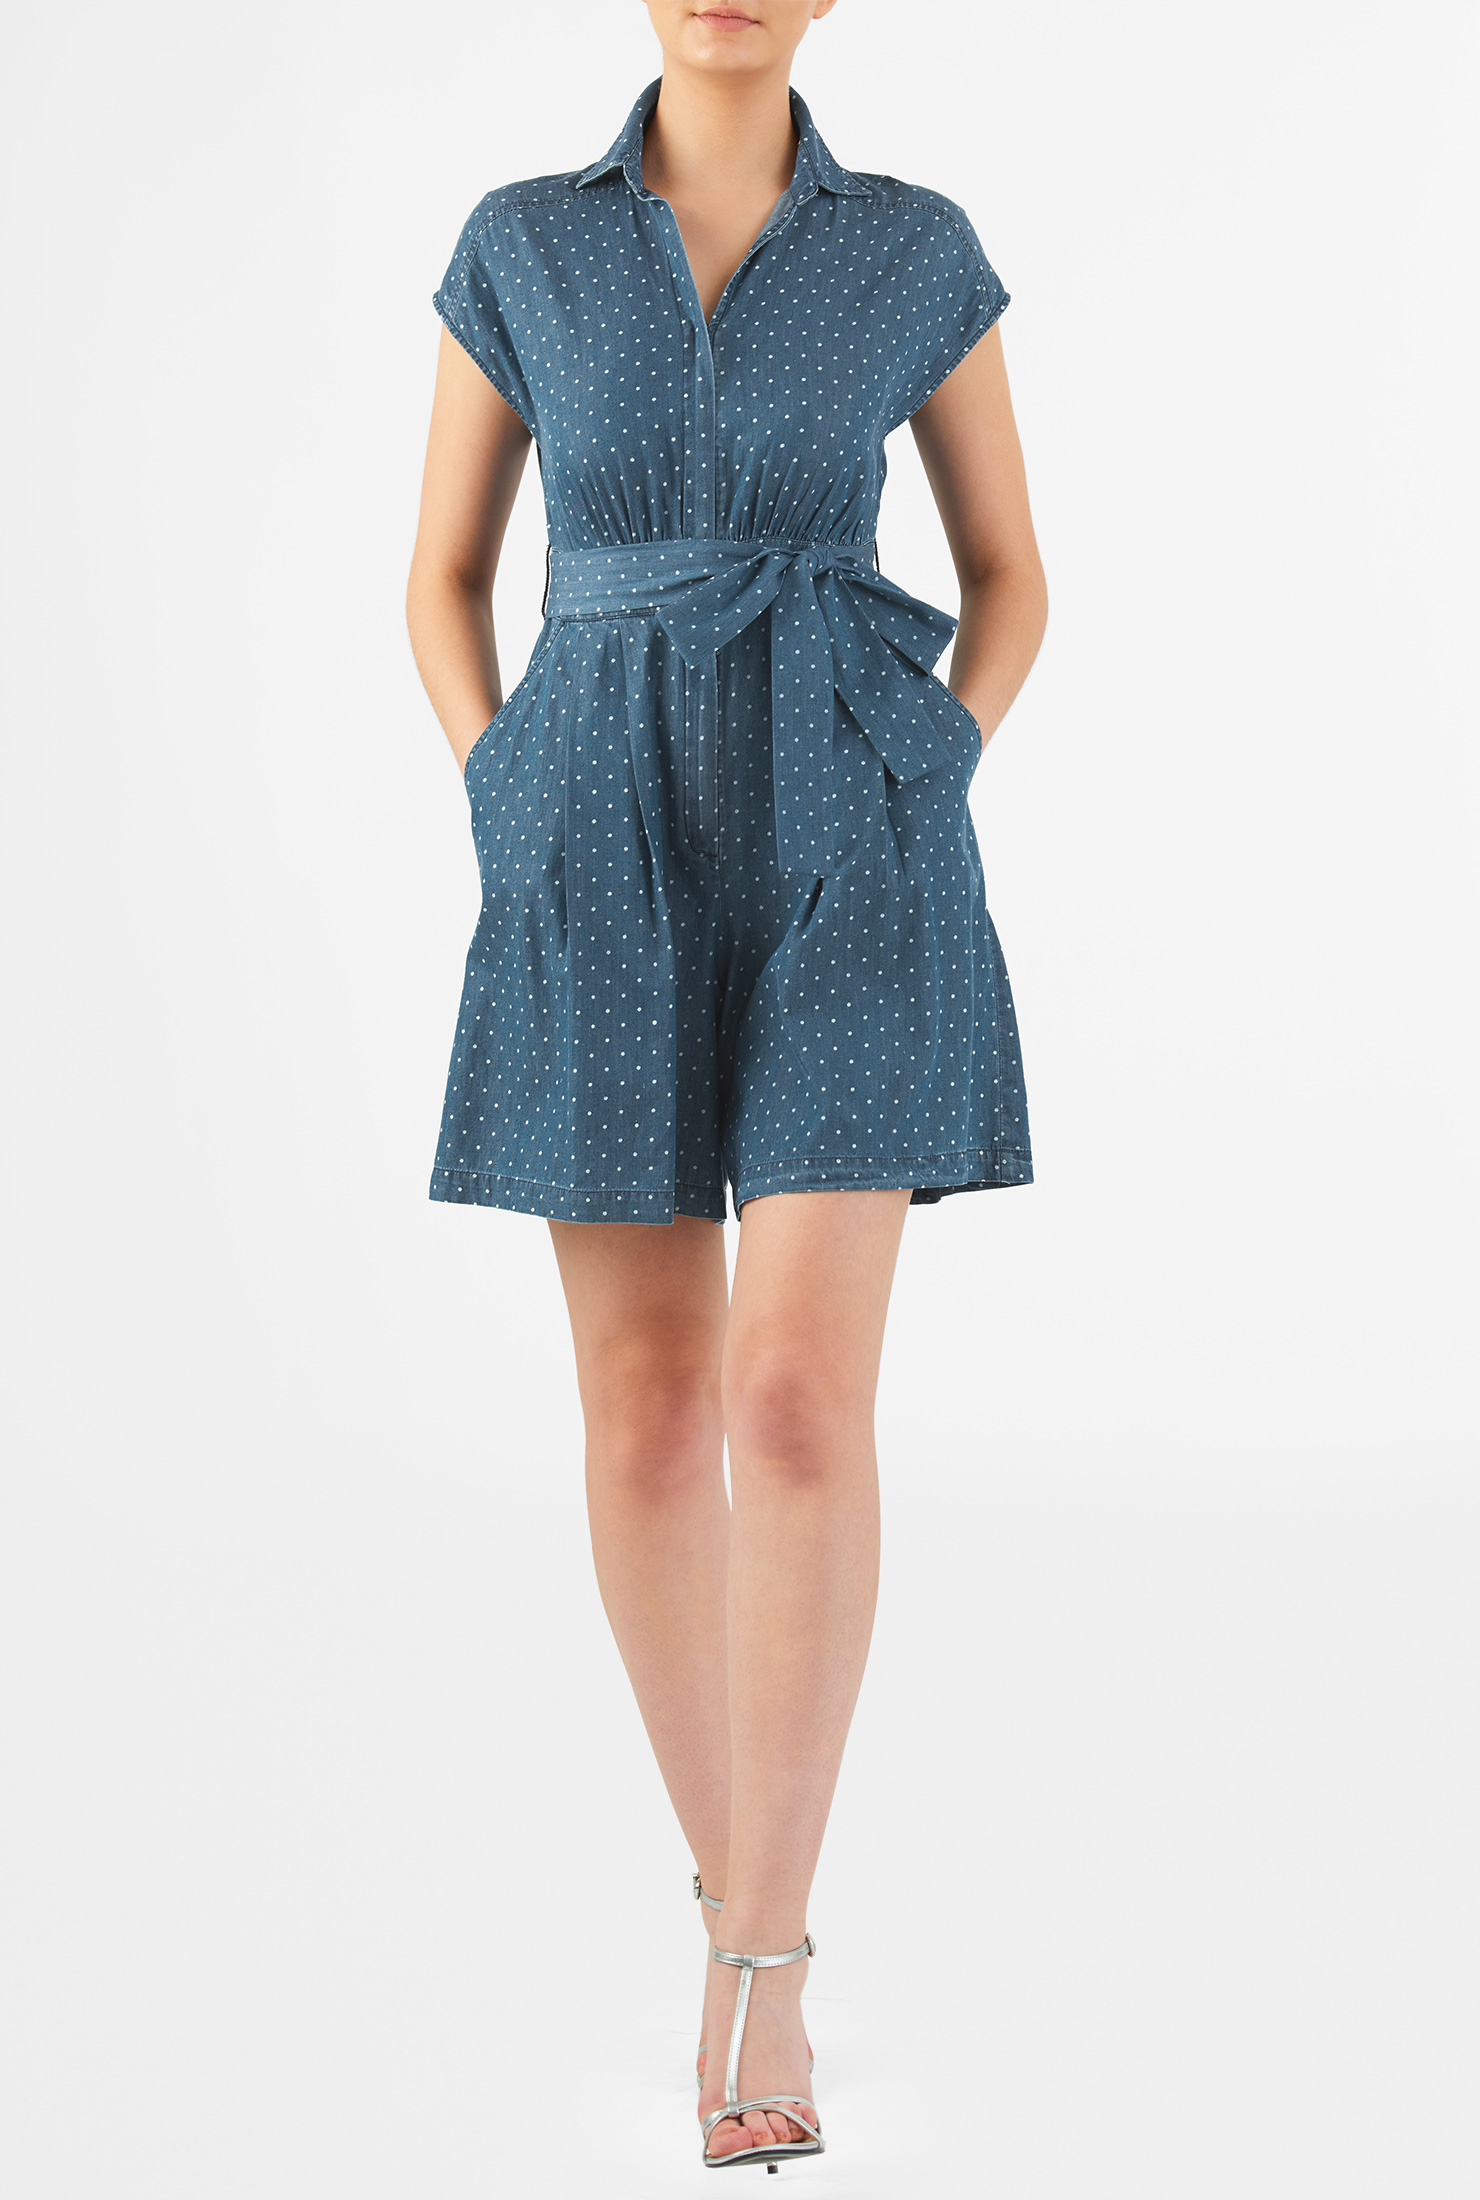 6676f9fd9212 Women s Fashion Clothing 0-36W and Custom